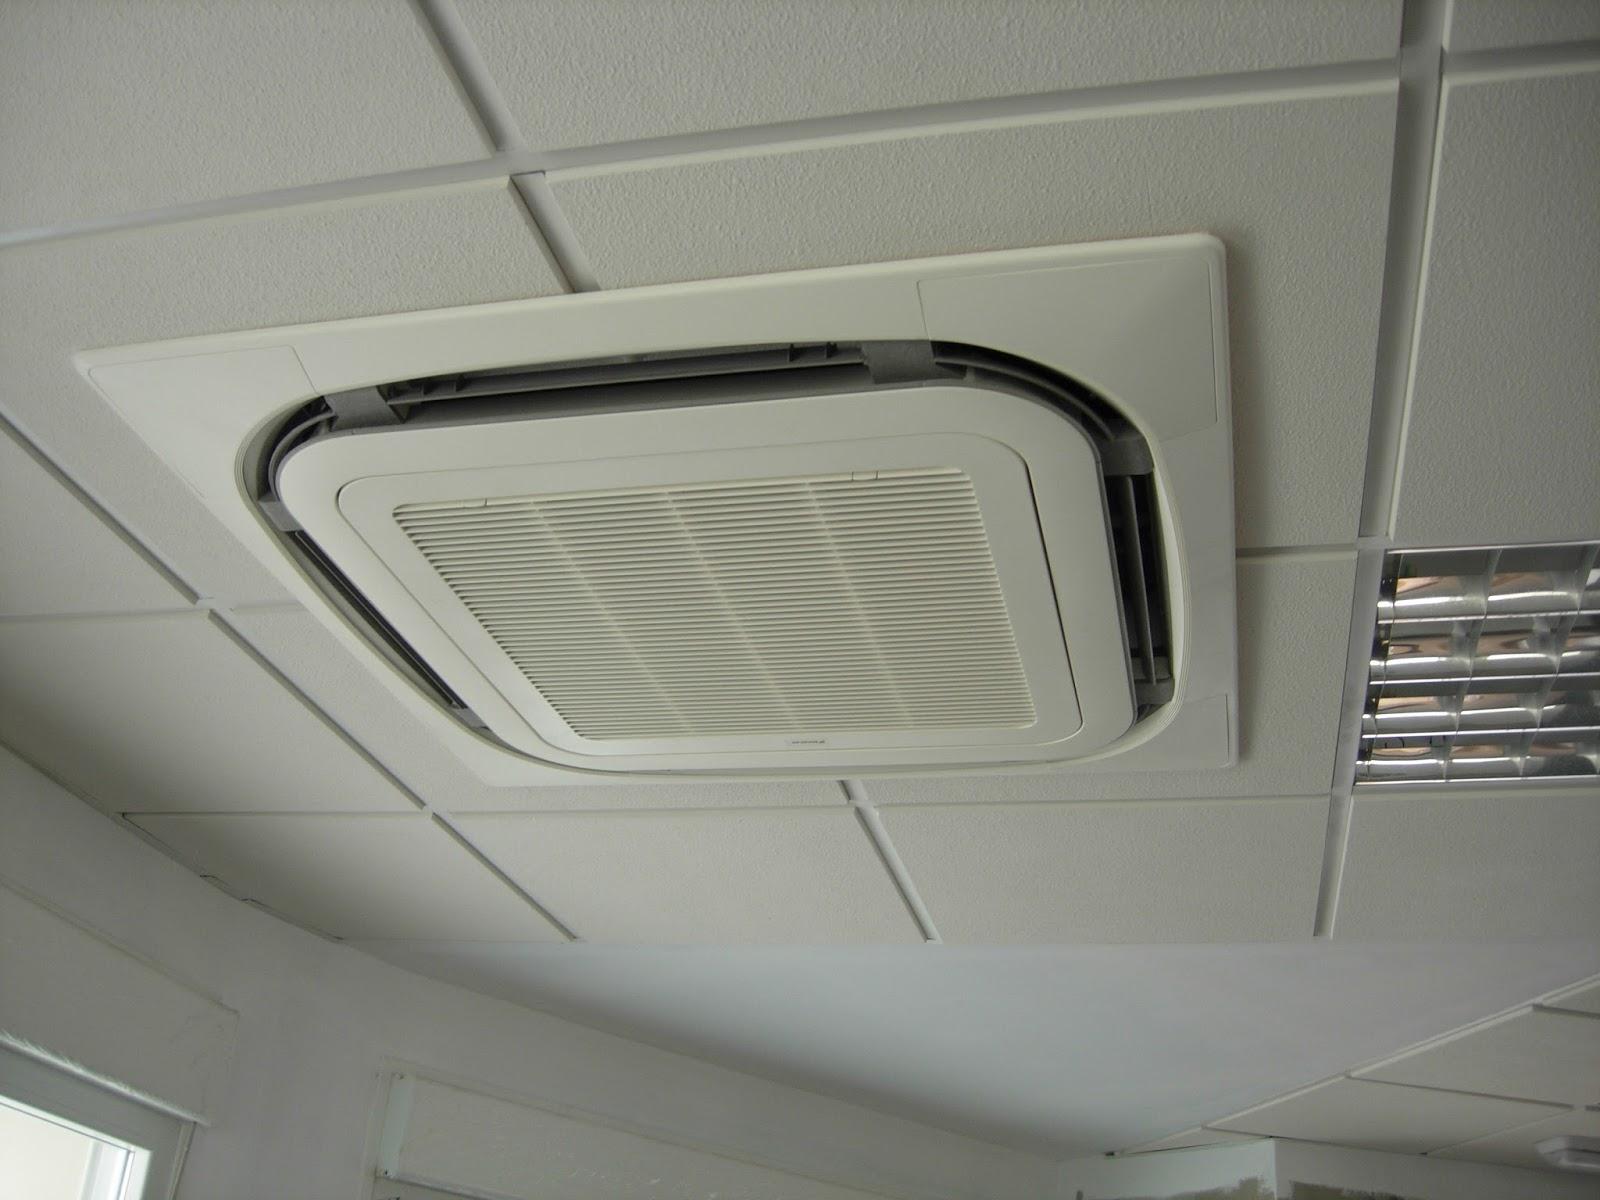 Aire acondicionado para empresas aire acondicionado for Aire acondicionado oficina